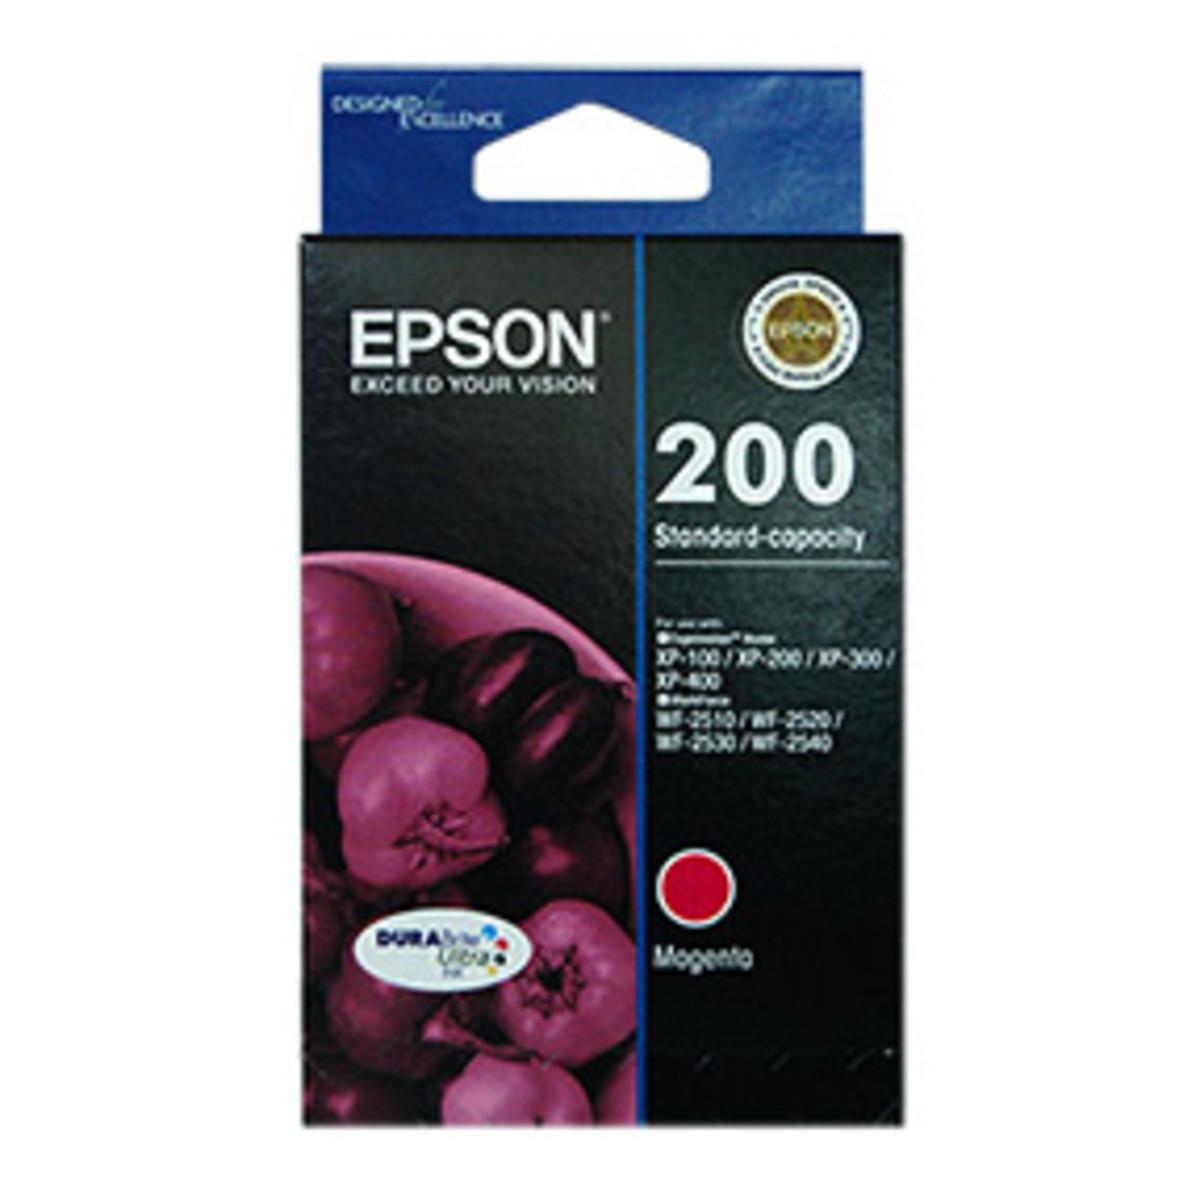 Epson 200 Magenta Ink Cartridge